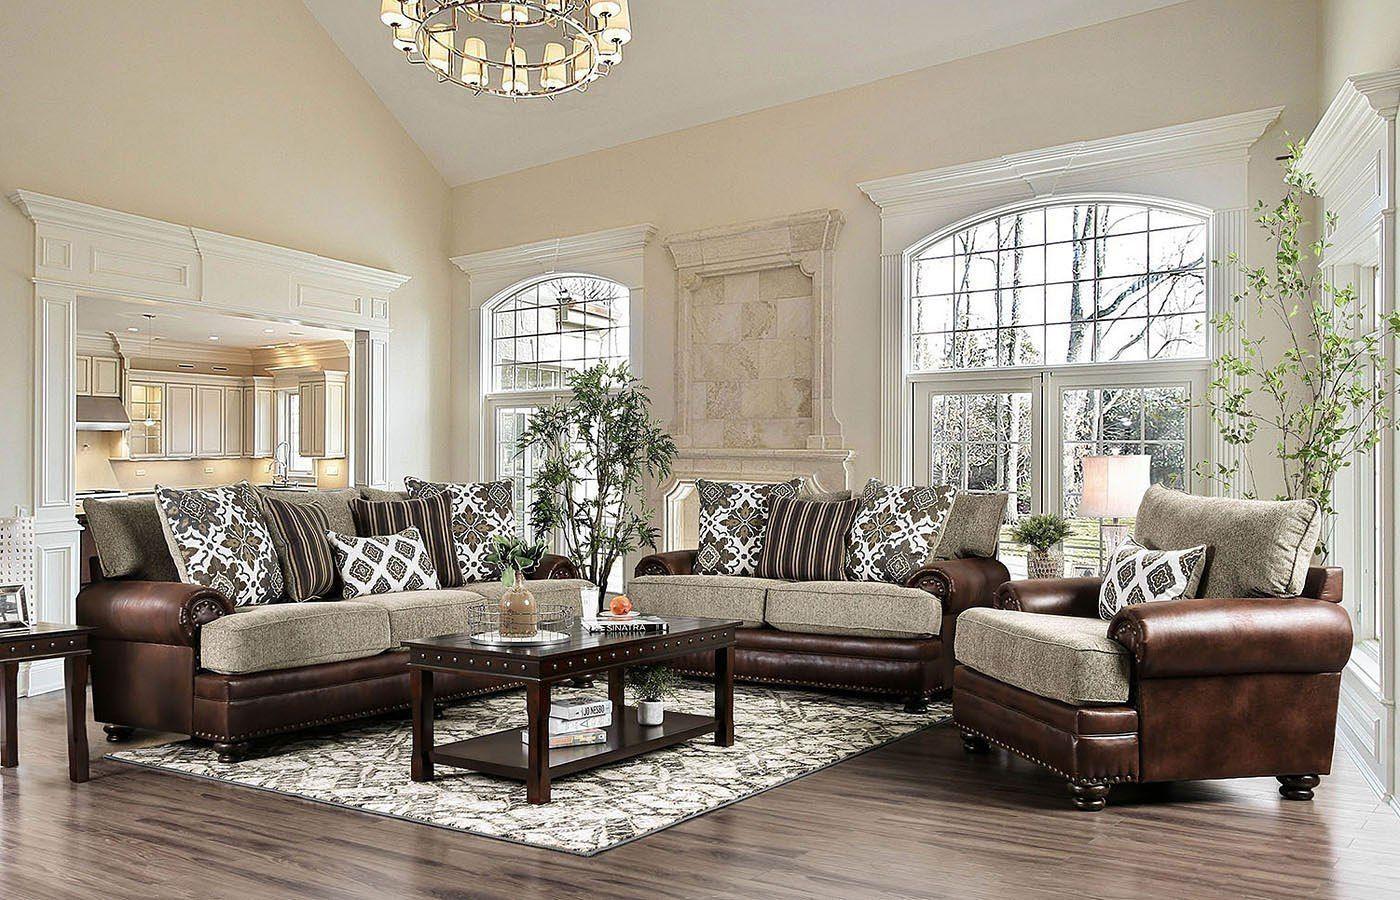 Reyna Living Room Set  Living room sets, Quality living room